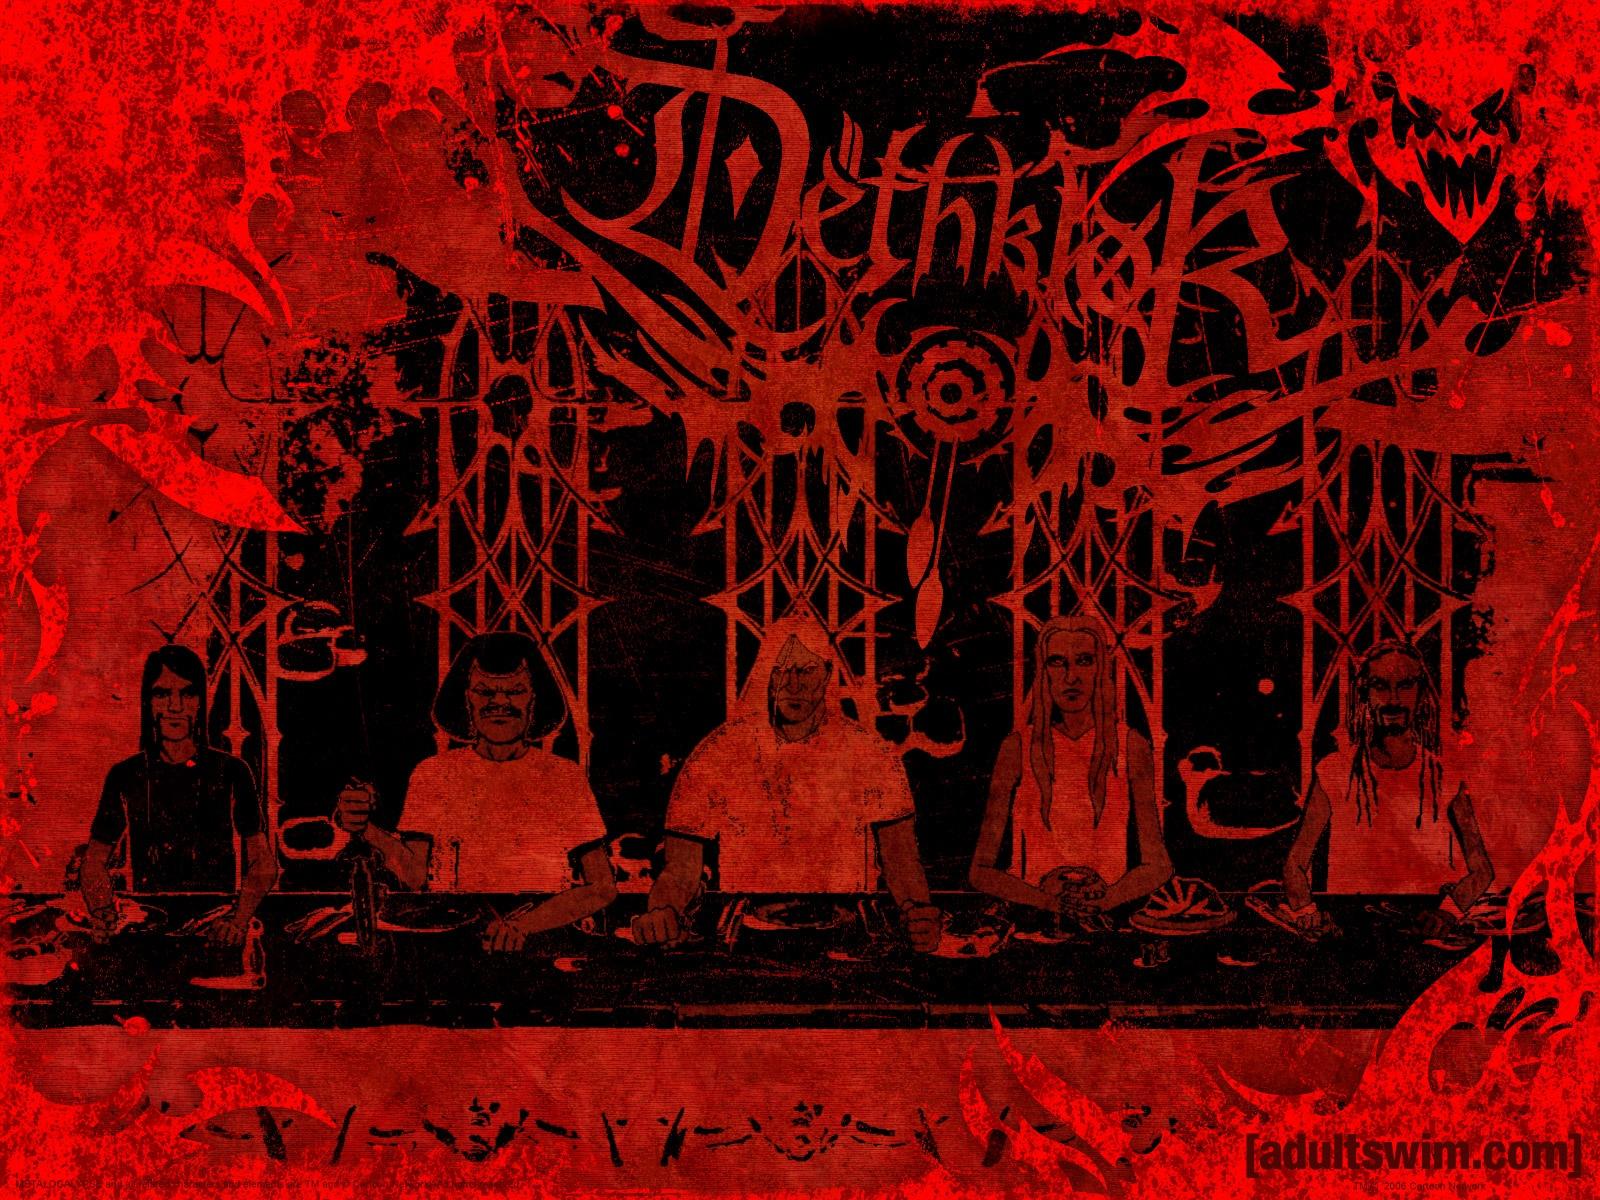 Dethklok heavy metal music cartoons hard rock band groups 1600x1200